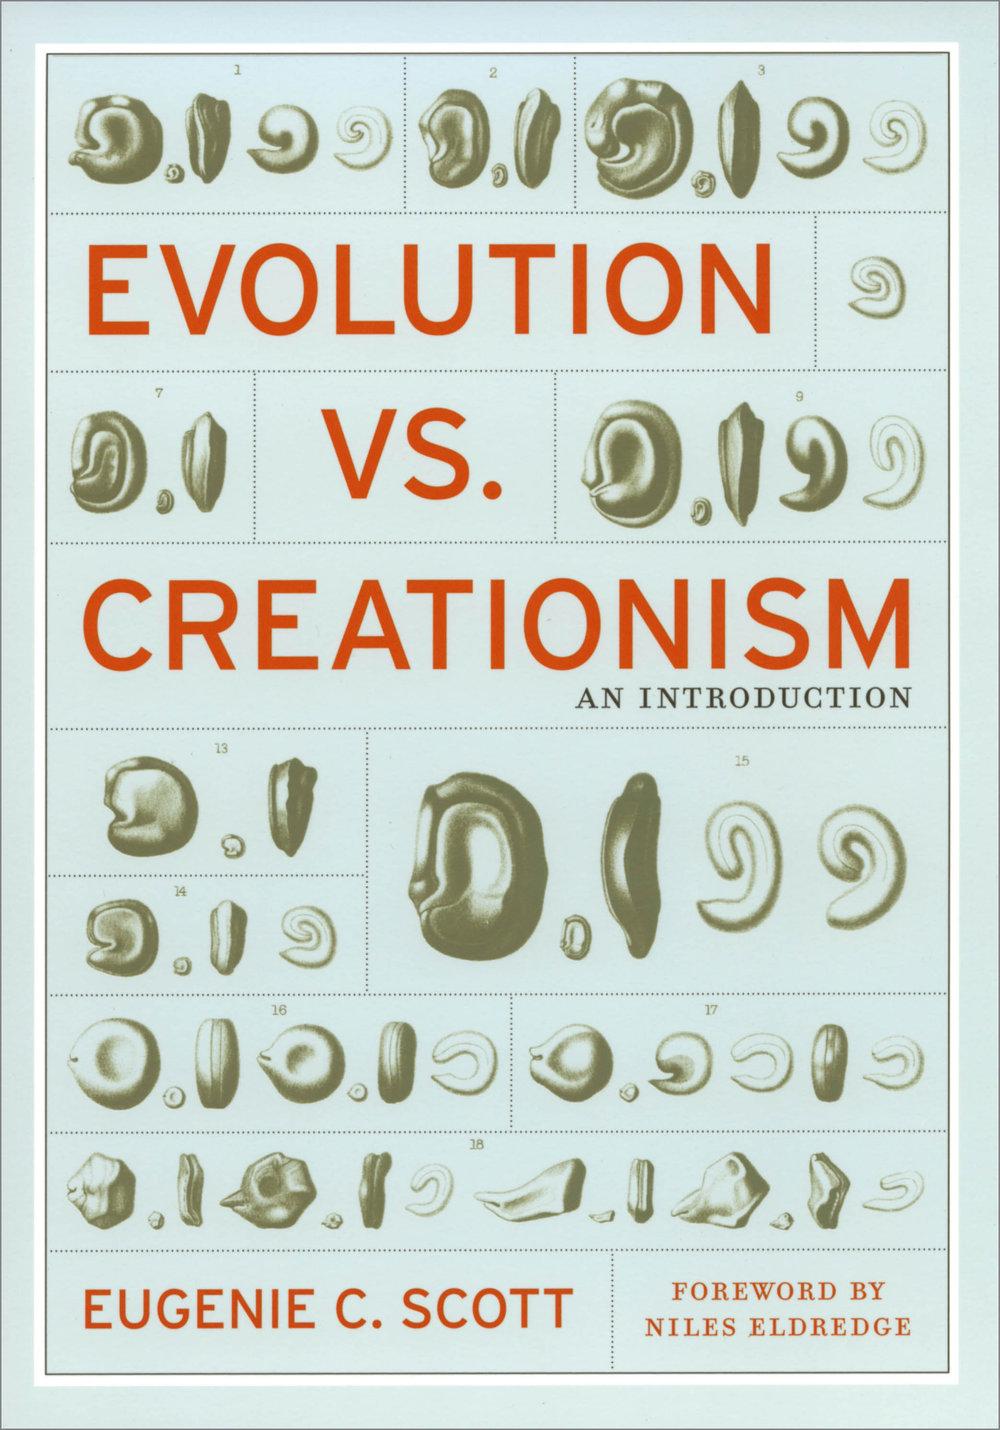 evolution-vs-creationism.jpg